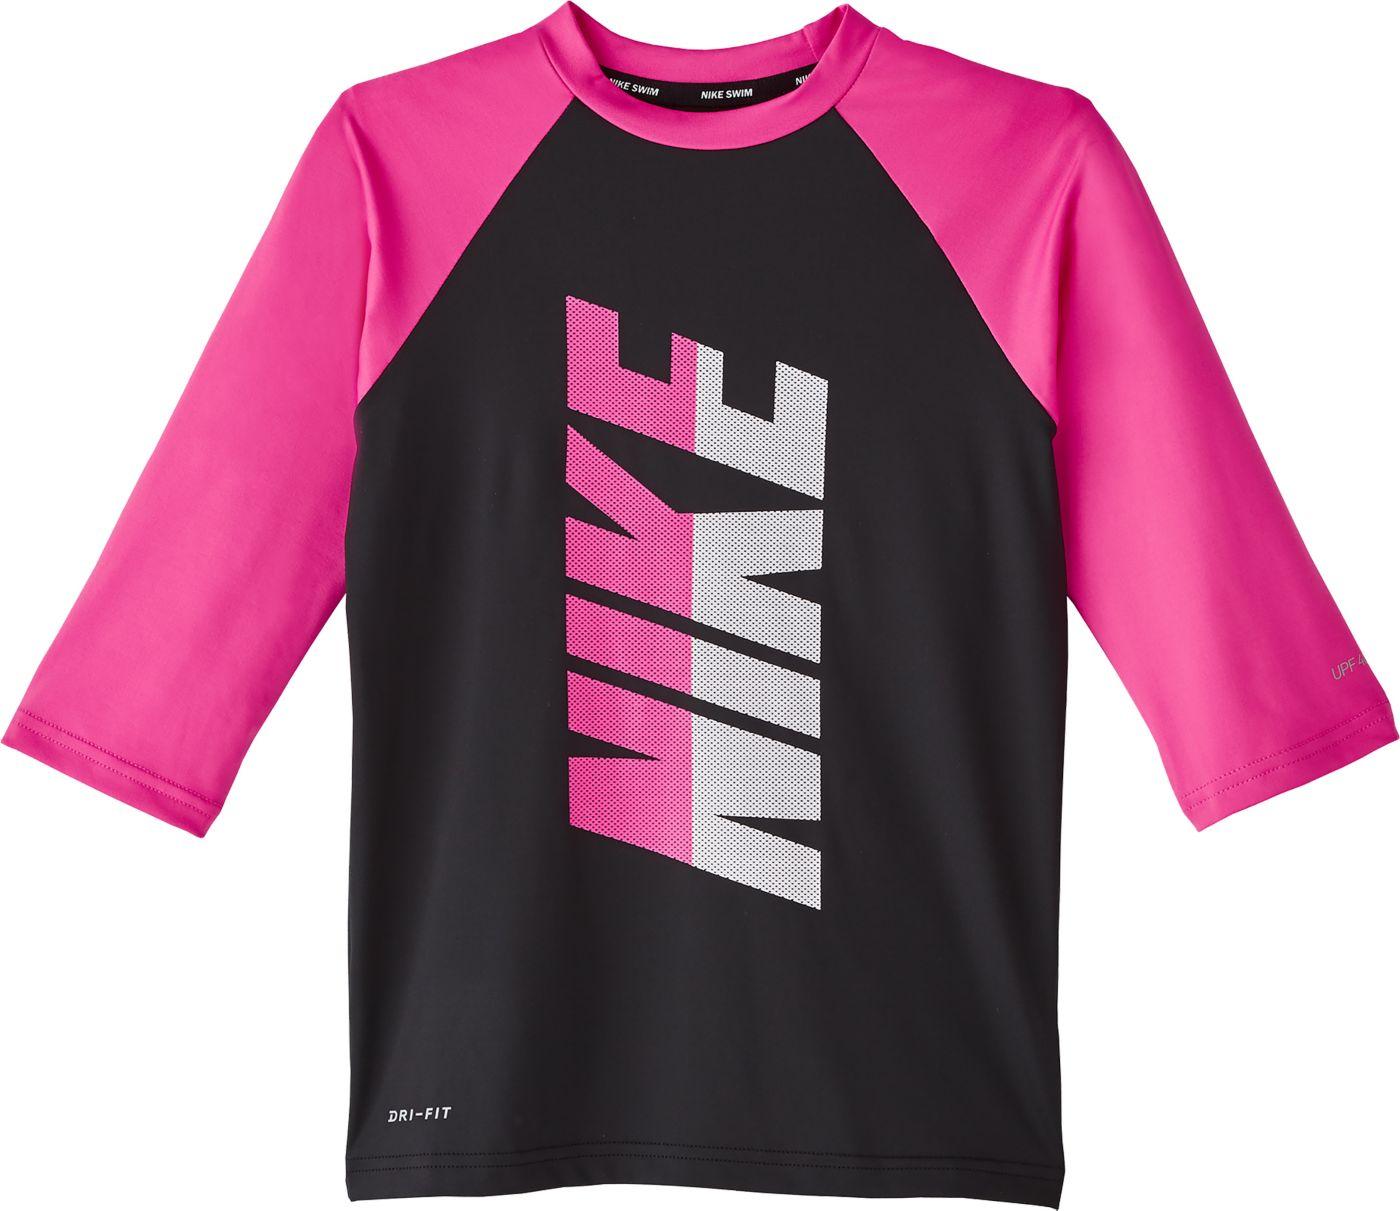 Nike Girls' Rift Short Sleeve Rash Guard